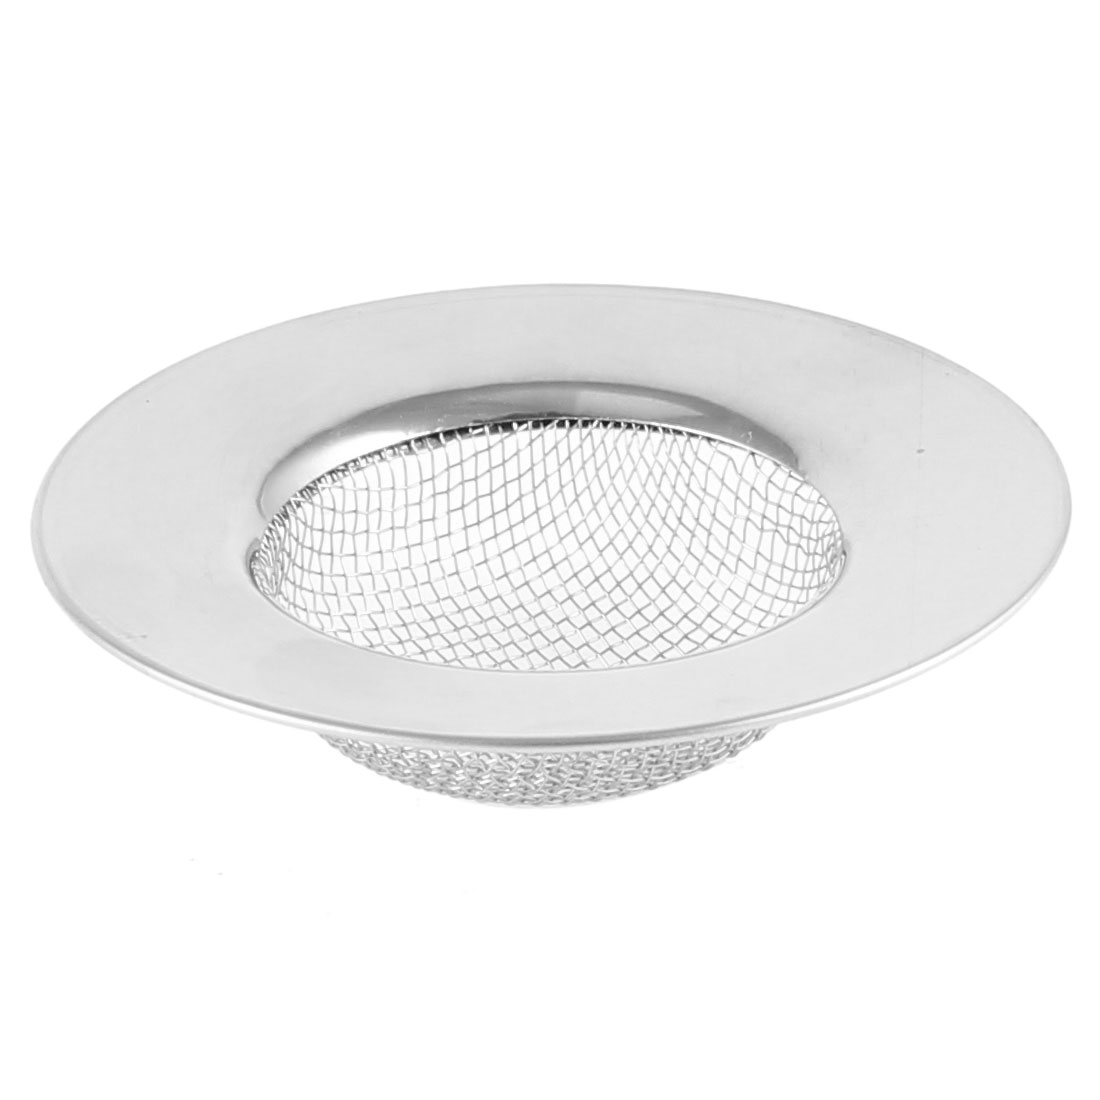 Kitchen Mesh Holes Design 77mm Dia Water Sink Drainer Strainer Silver Tone